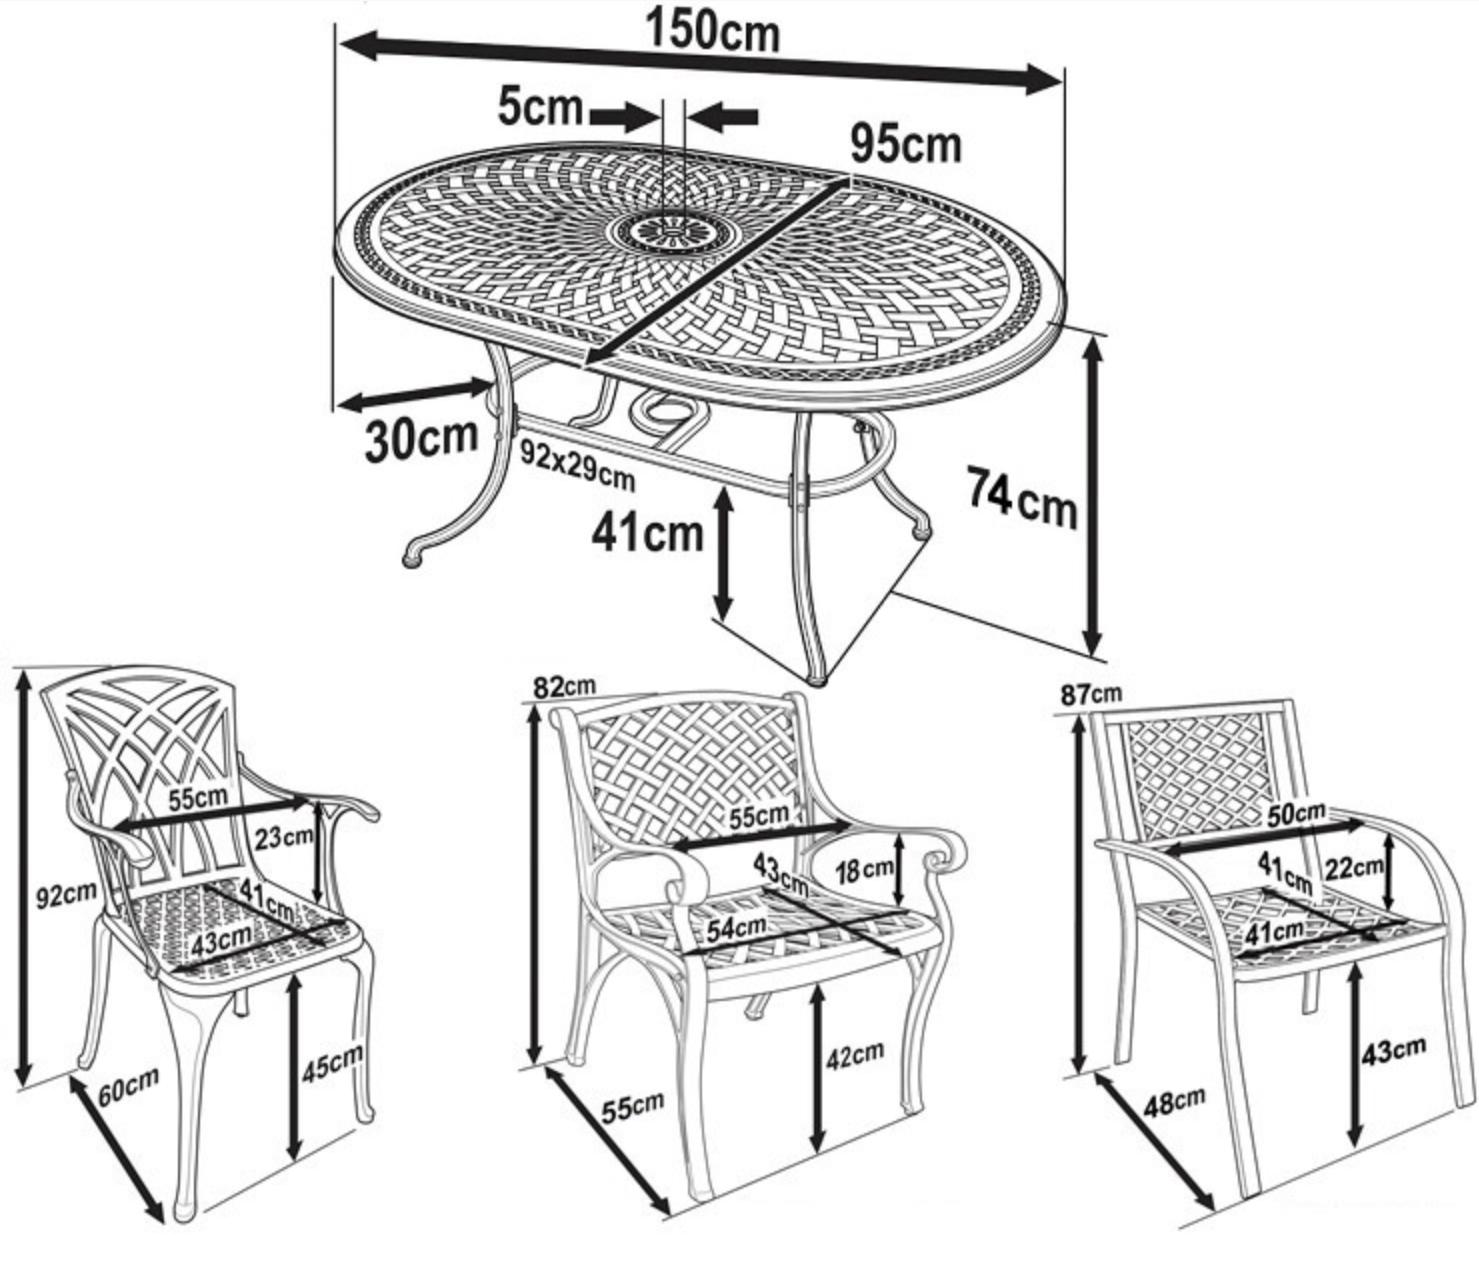 June Patio Table Dimensions